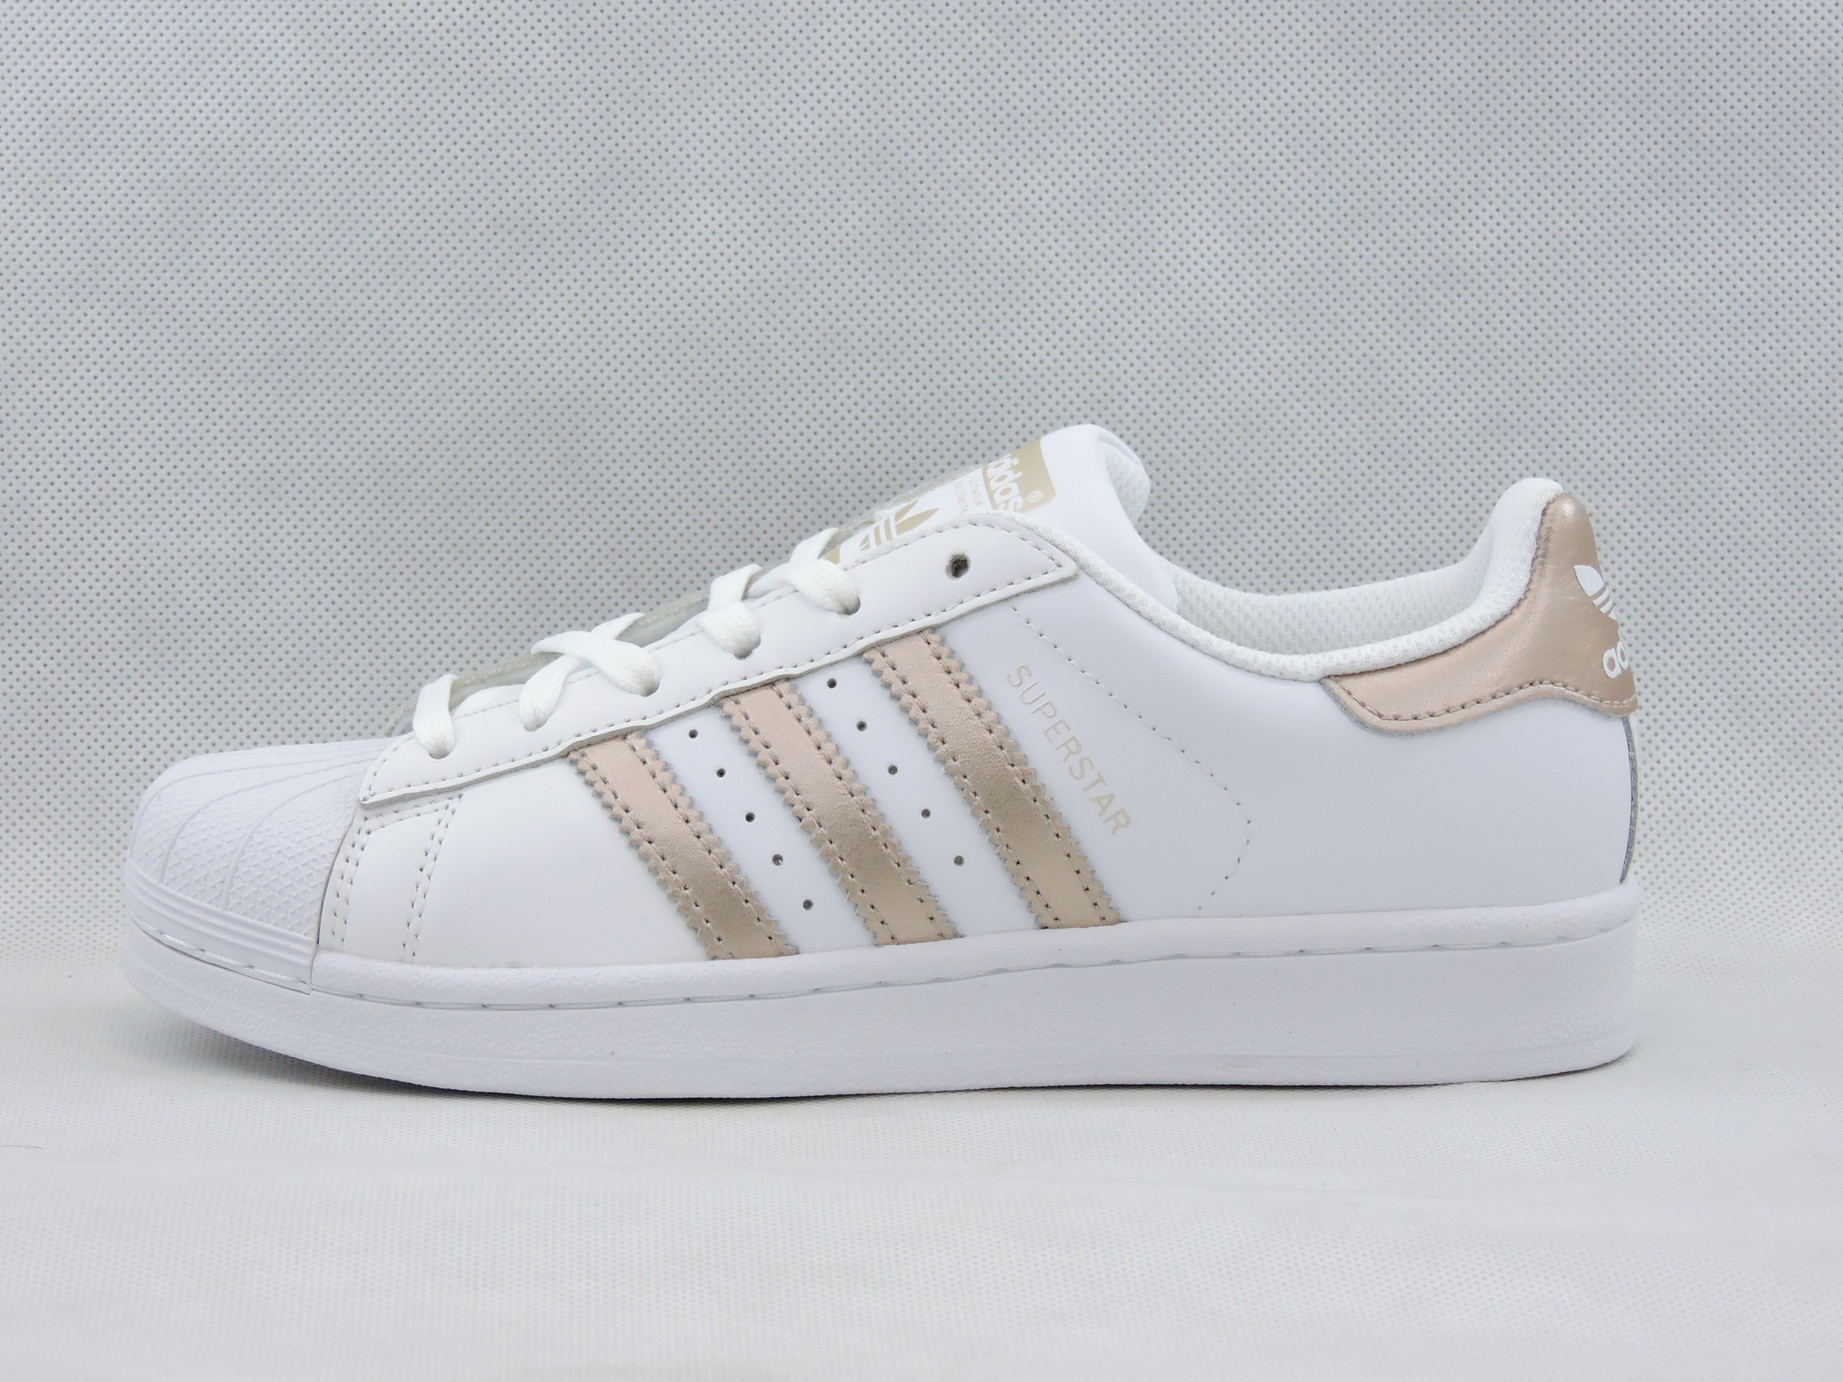 timeless design d23b6 462b6 clearance sneakers white adidas superstar j c77154 f1ec2 51638  release  date buty adidas superstar ba8169 r37 1 3 sklep 24h pl 7312a c7d1a